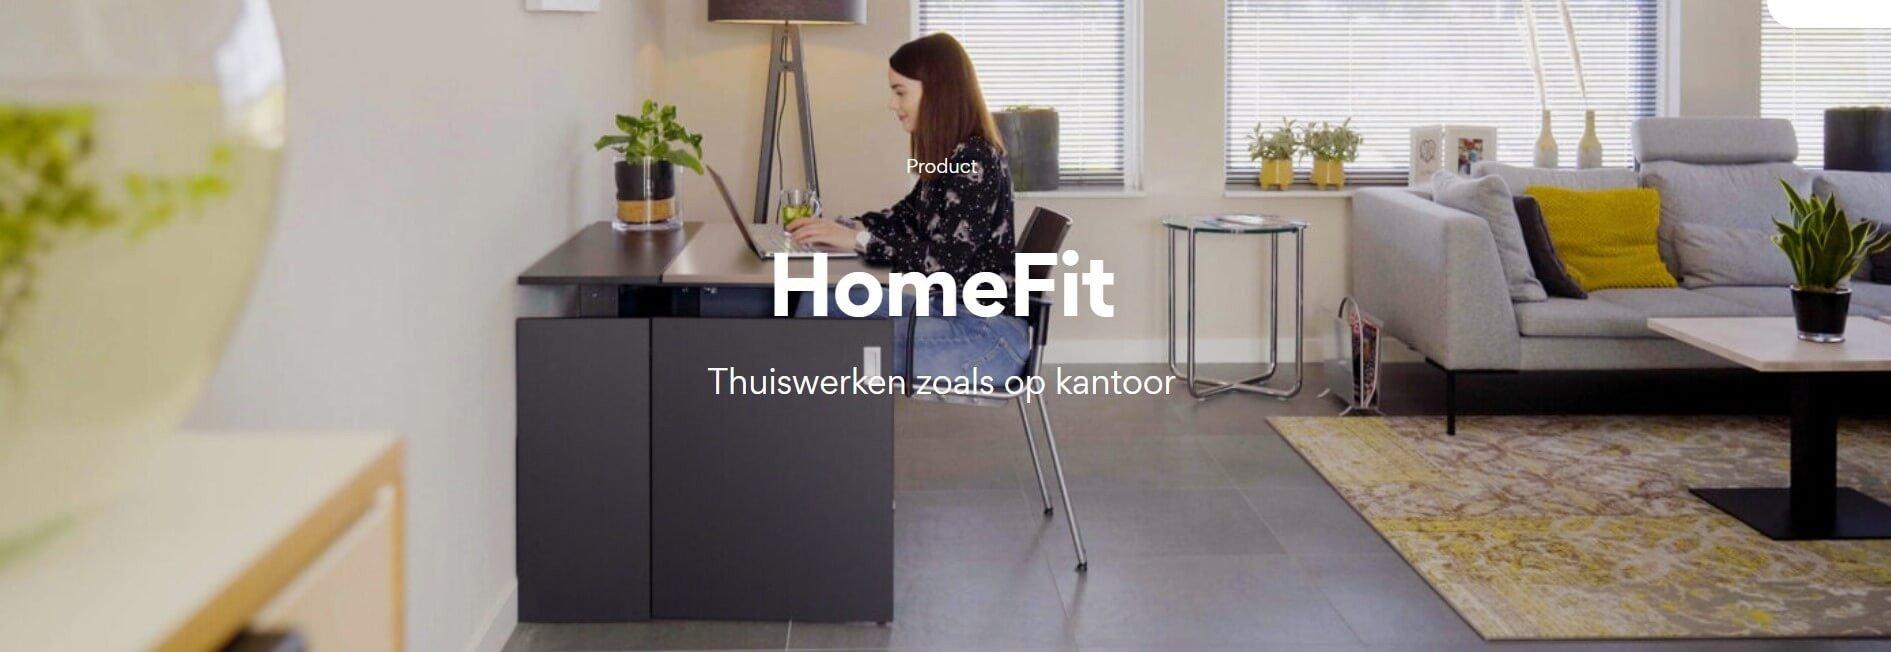 HomeFit zit-sta bureau t.jpg